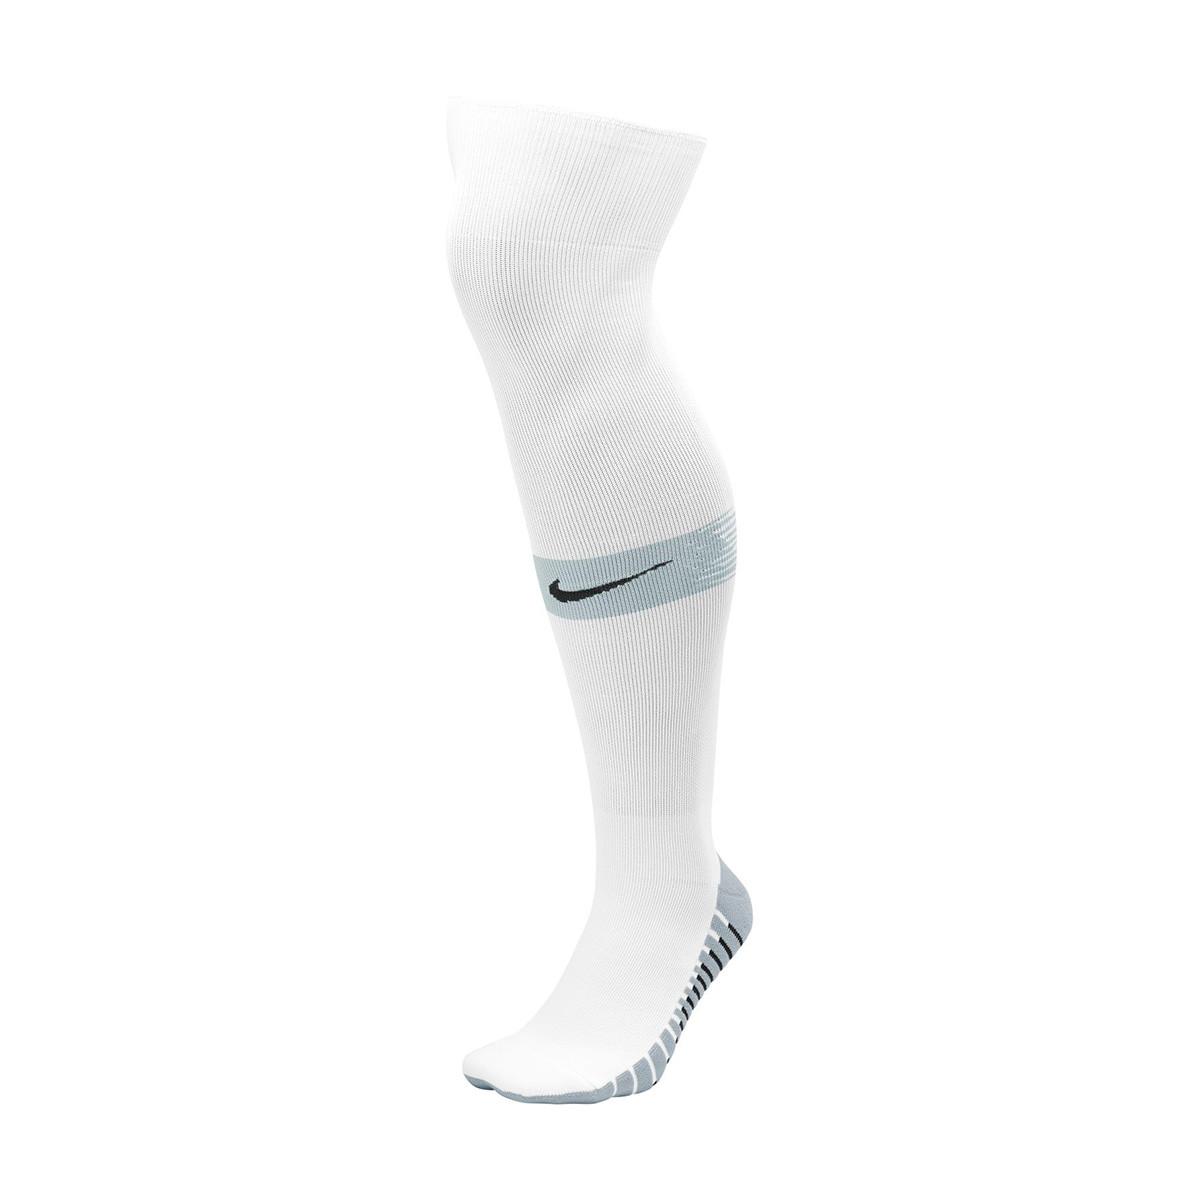 ac59c0af395b Football Socks Nike Team Matchfit Over-the-Calf White-Jetstream ...